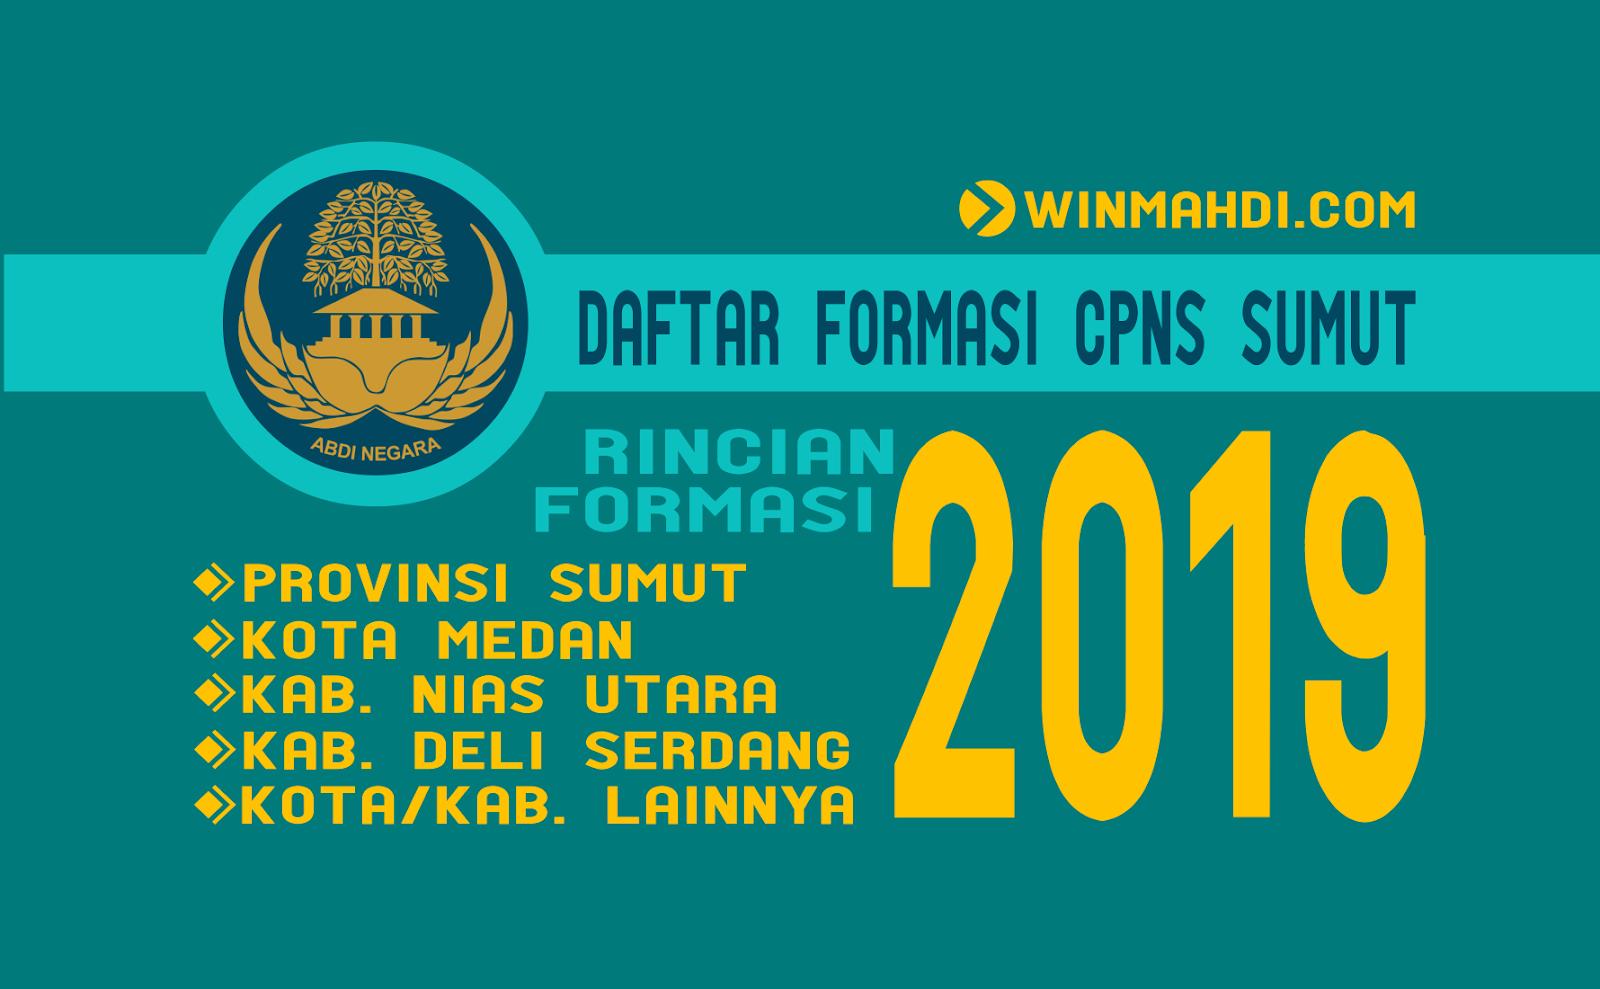 Formasi CPNS SUMUT 2019